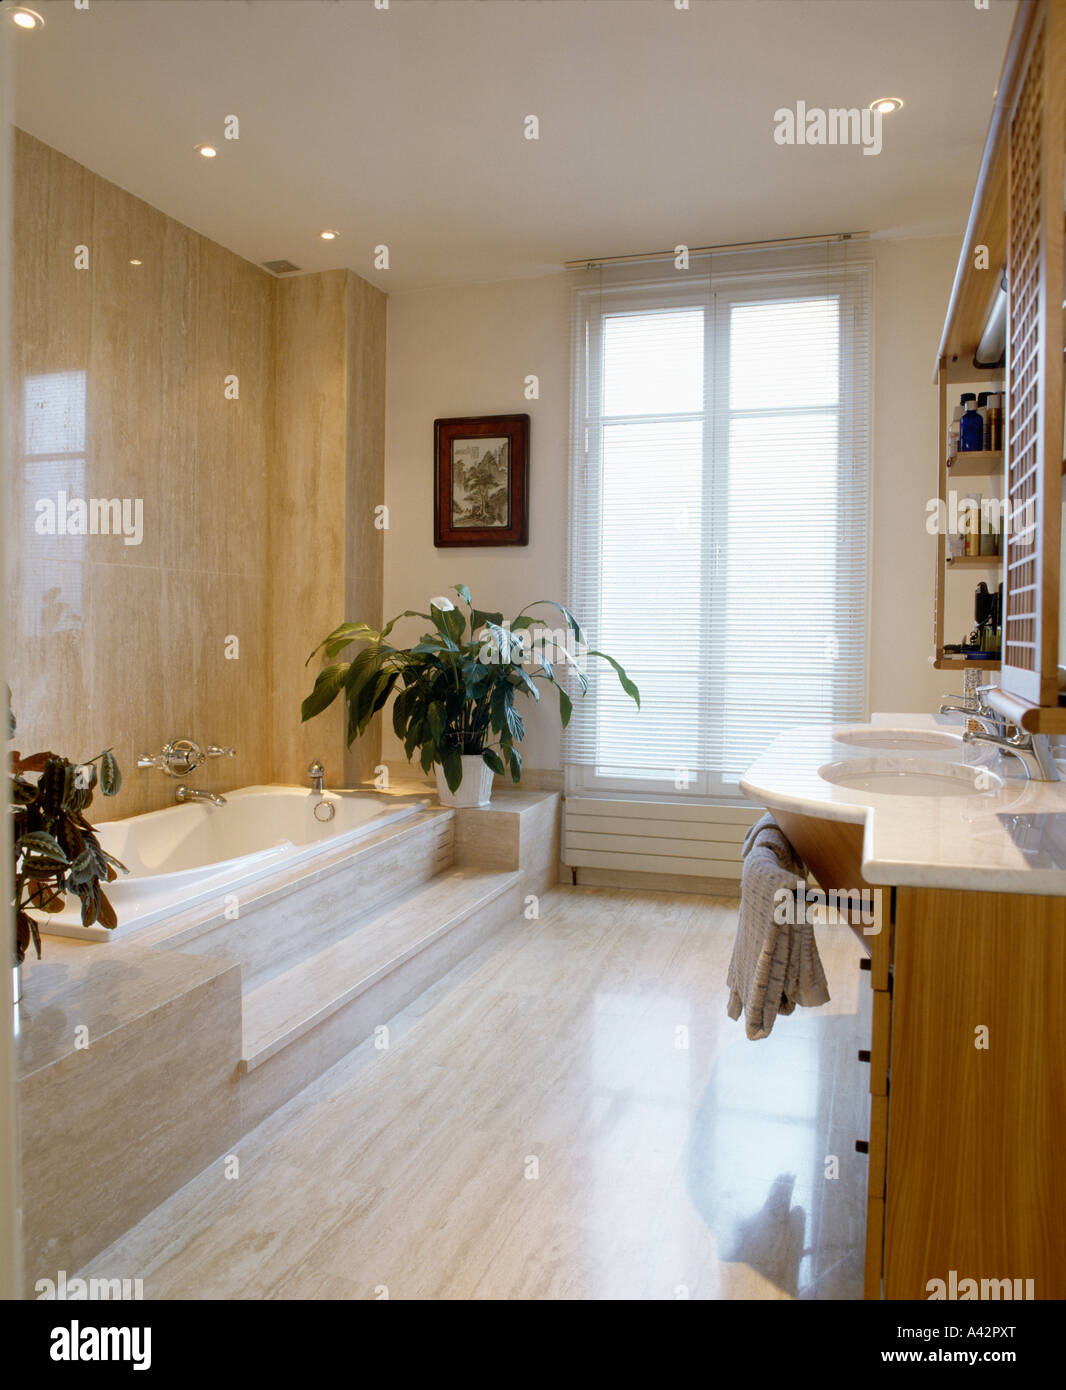 Badezimmer Wande Glatten Molto Einfach Glatt Anleitung Glatte Wand